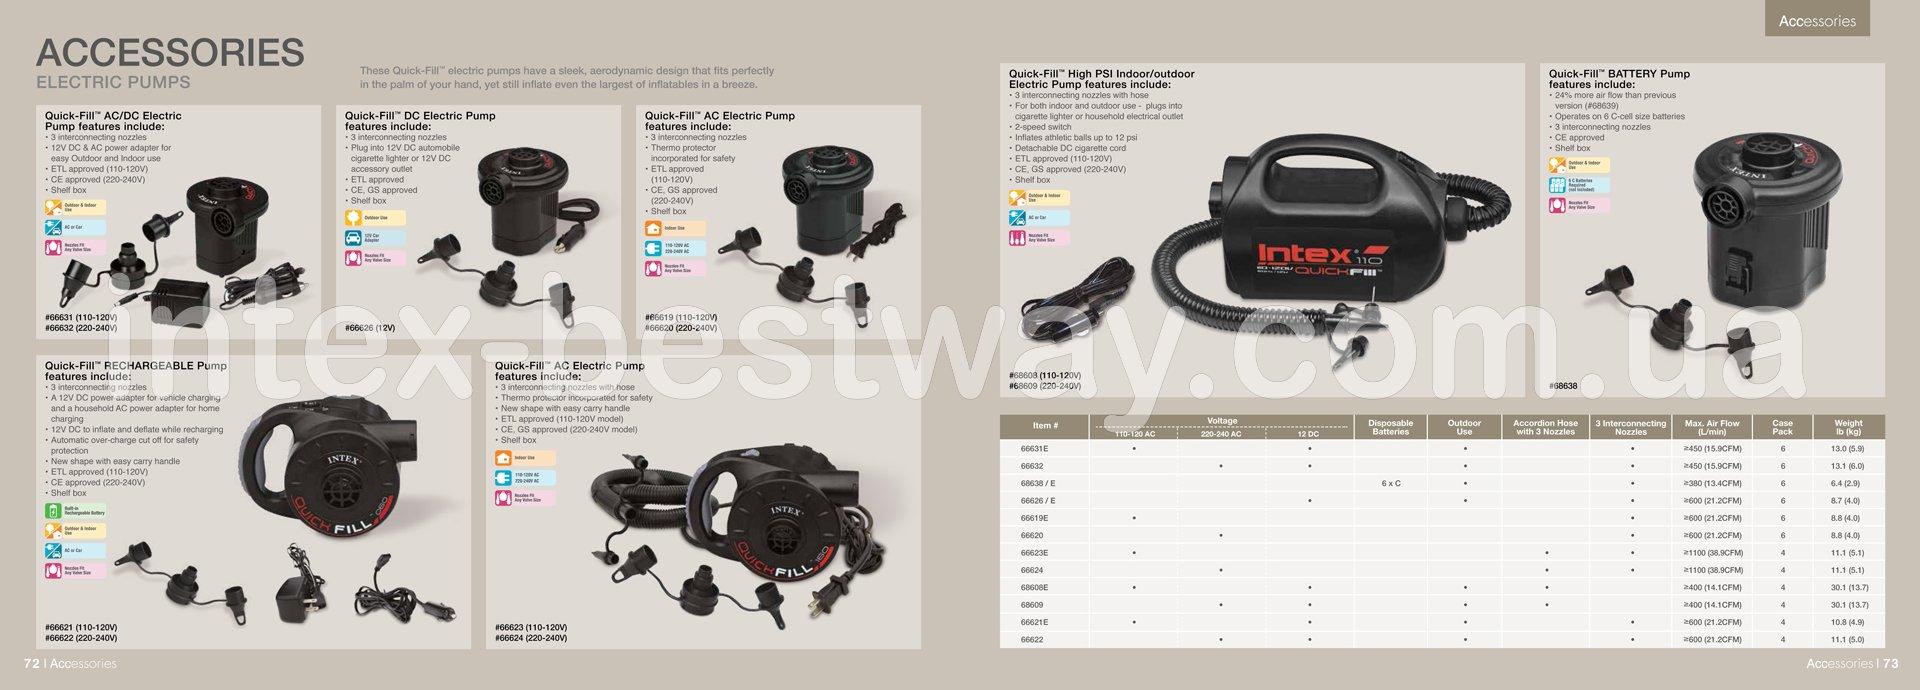 Электрические насосы Intex, насосы от 220 Вольт, насосы от прикуривателя 12 Вольт, насосы от аккумуляторов или батареек